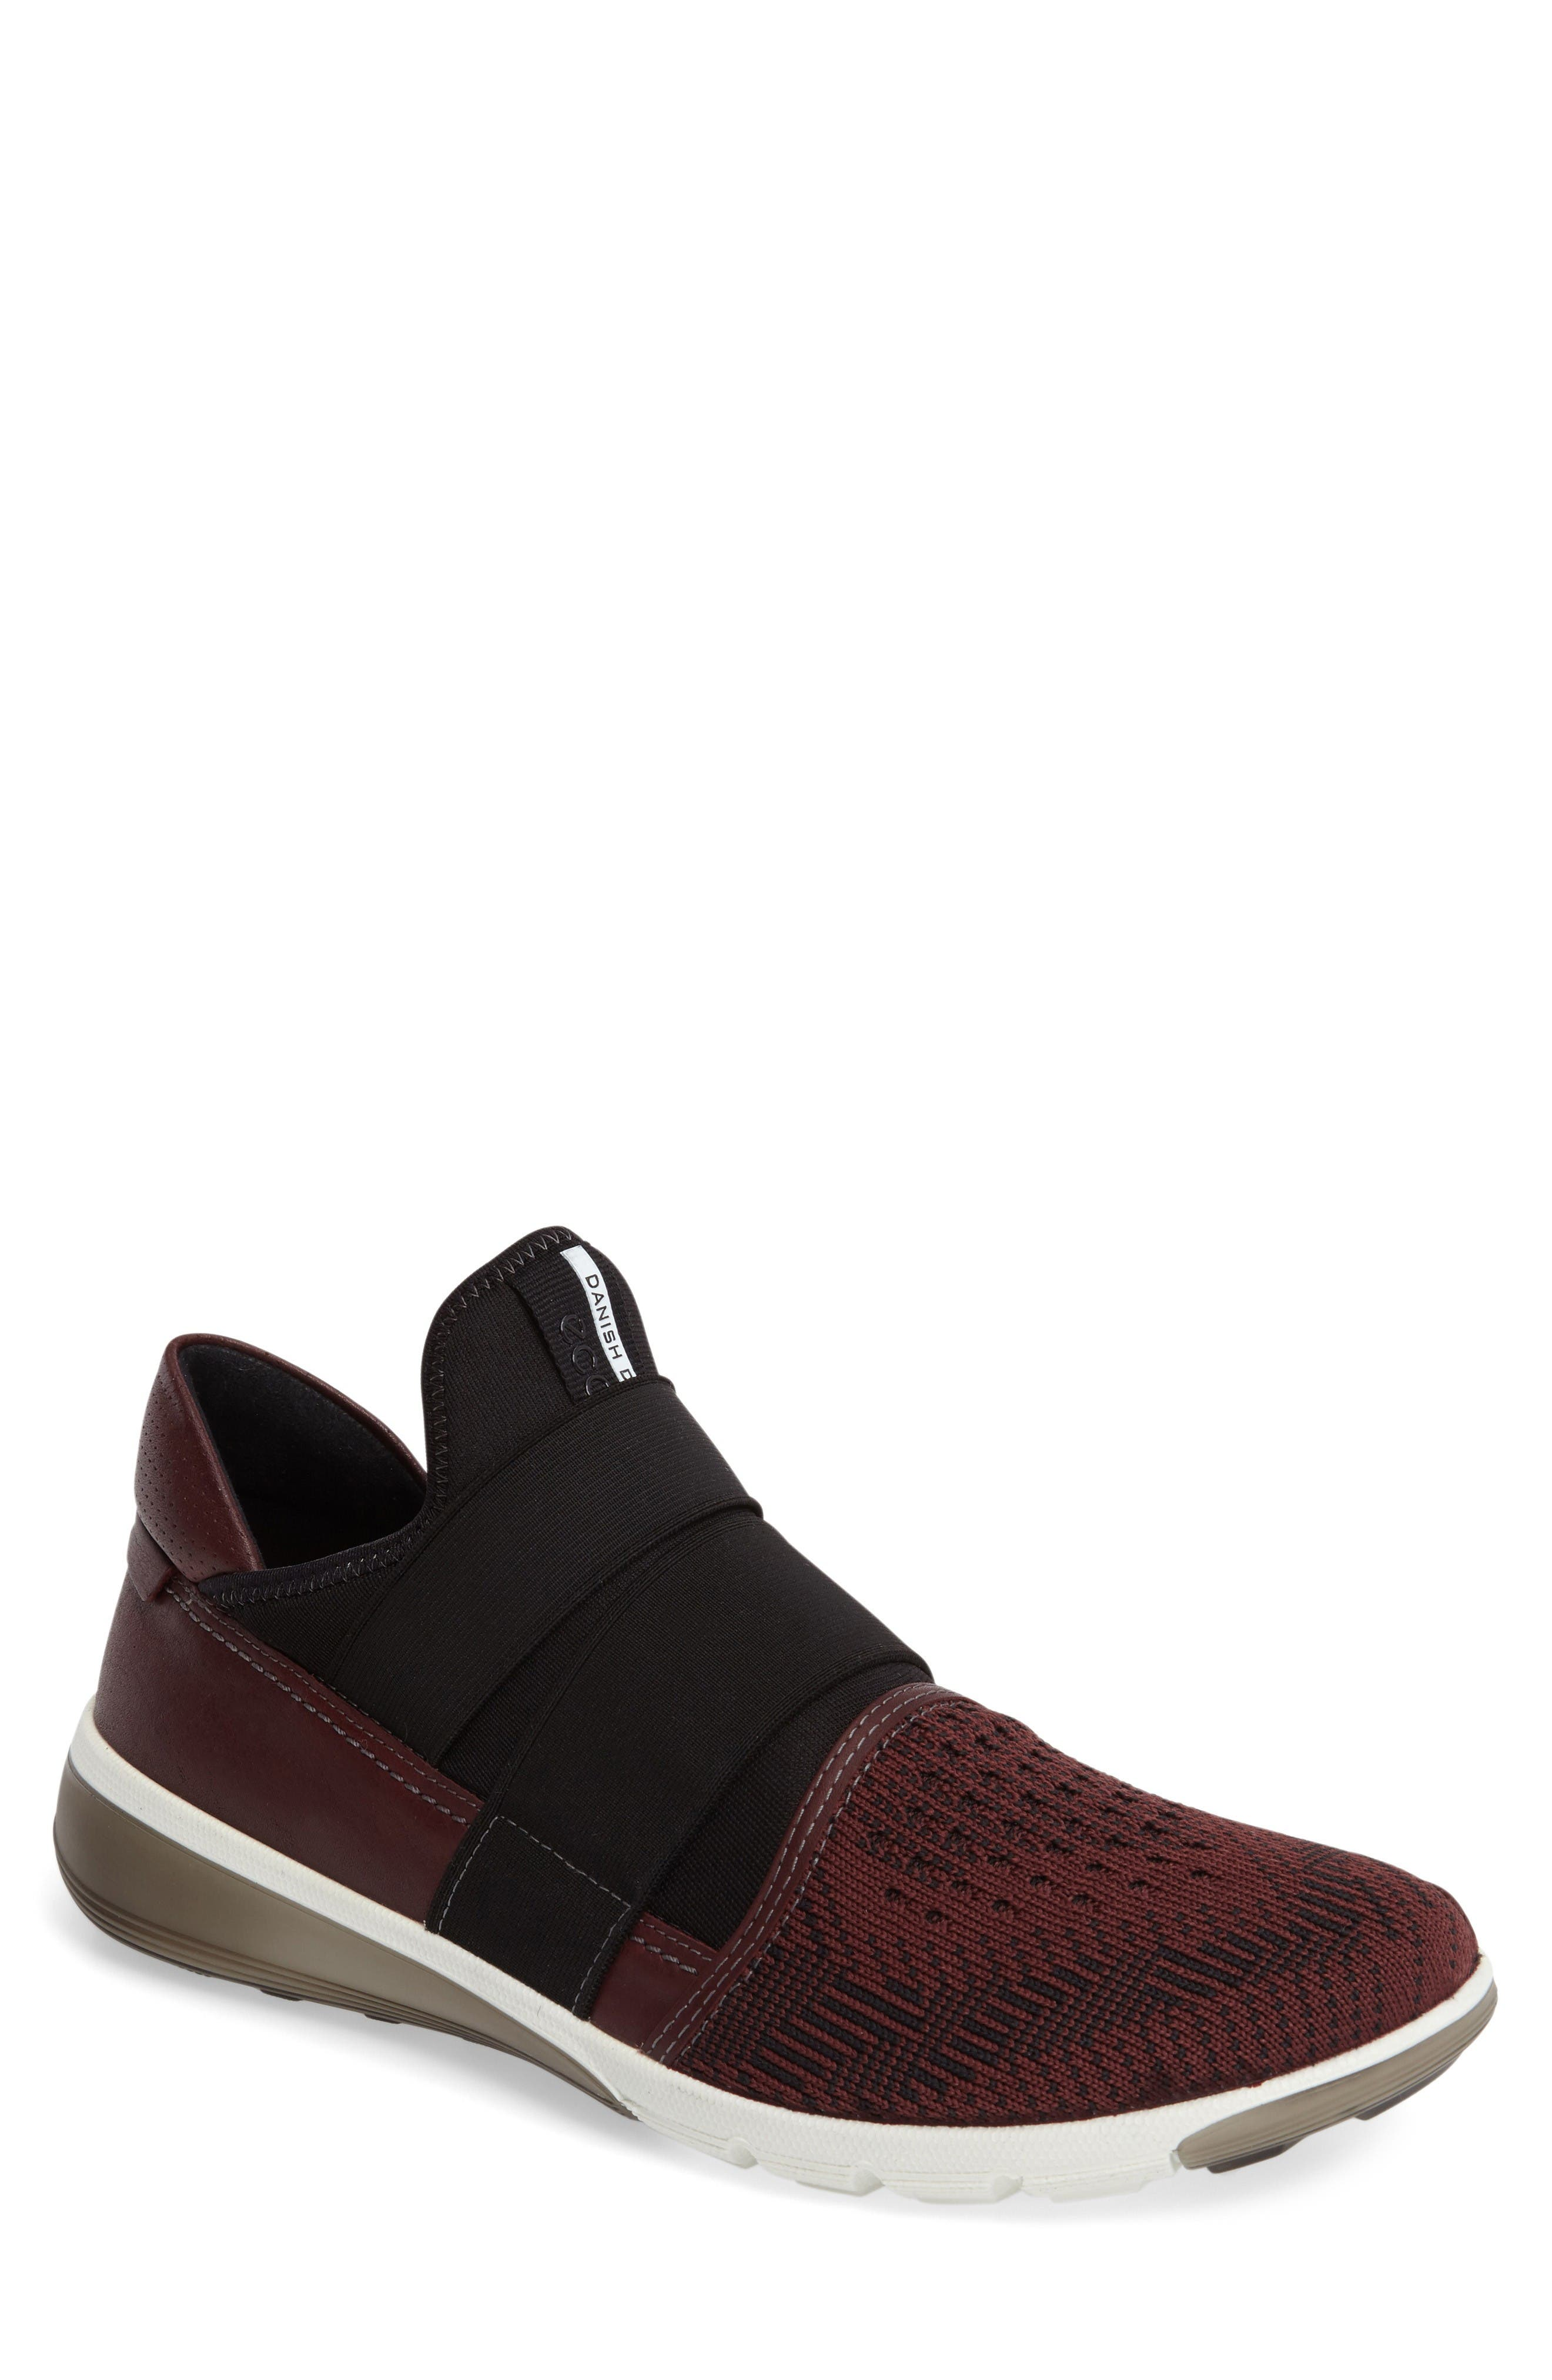 Main Image - ECCO 'Intrinsic' Sneaker (Men)